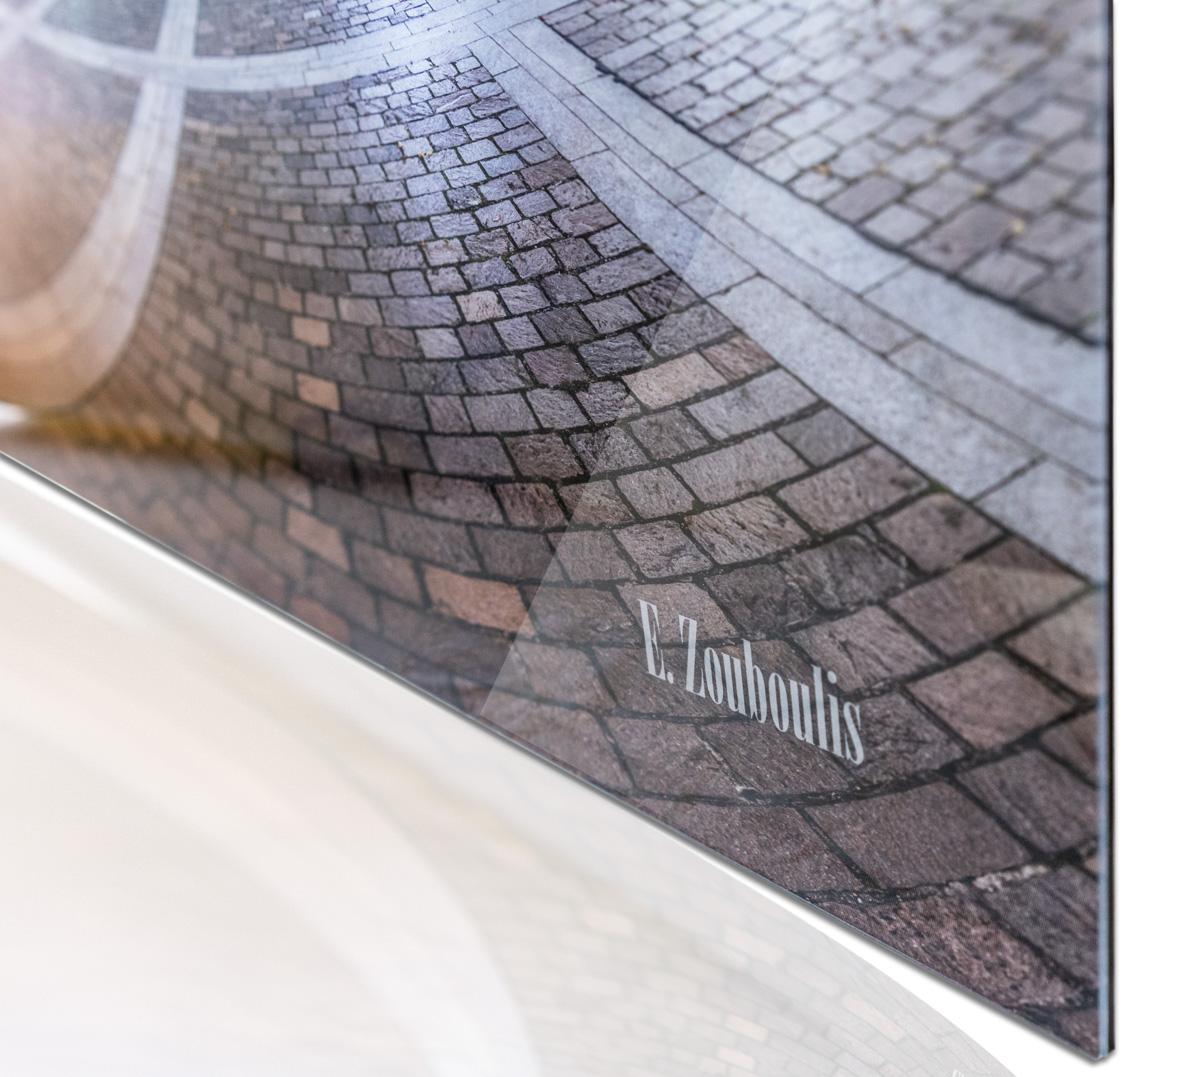 Acrylglasbilder - Hochwertige Wandbilder